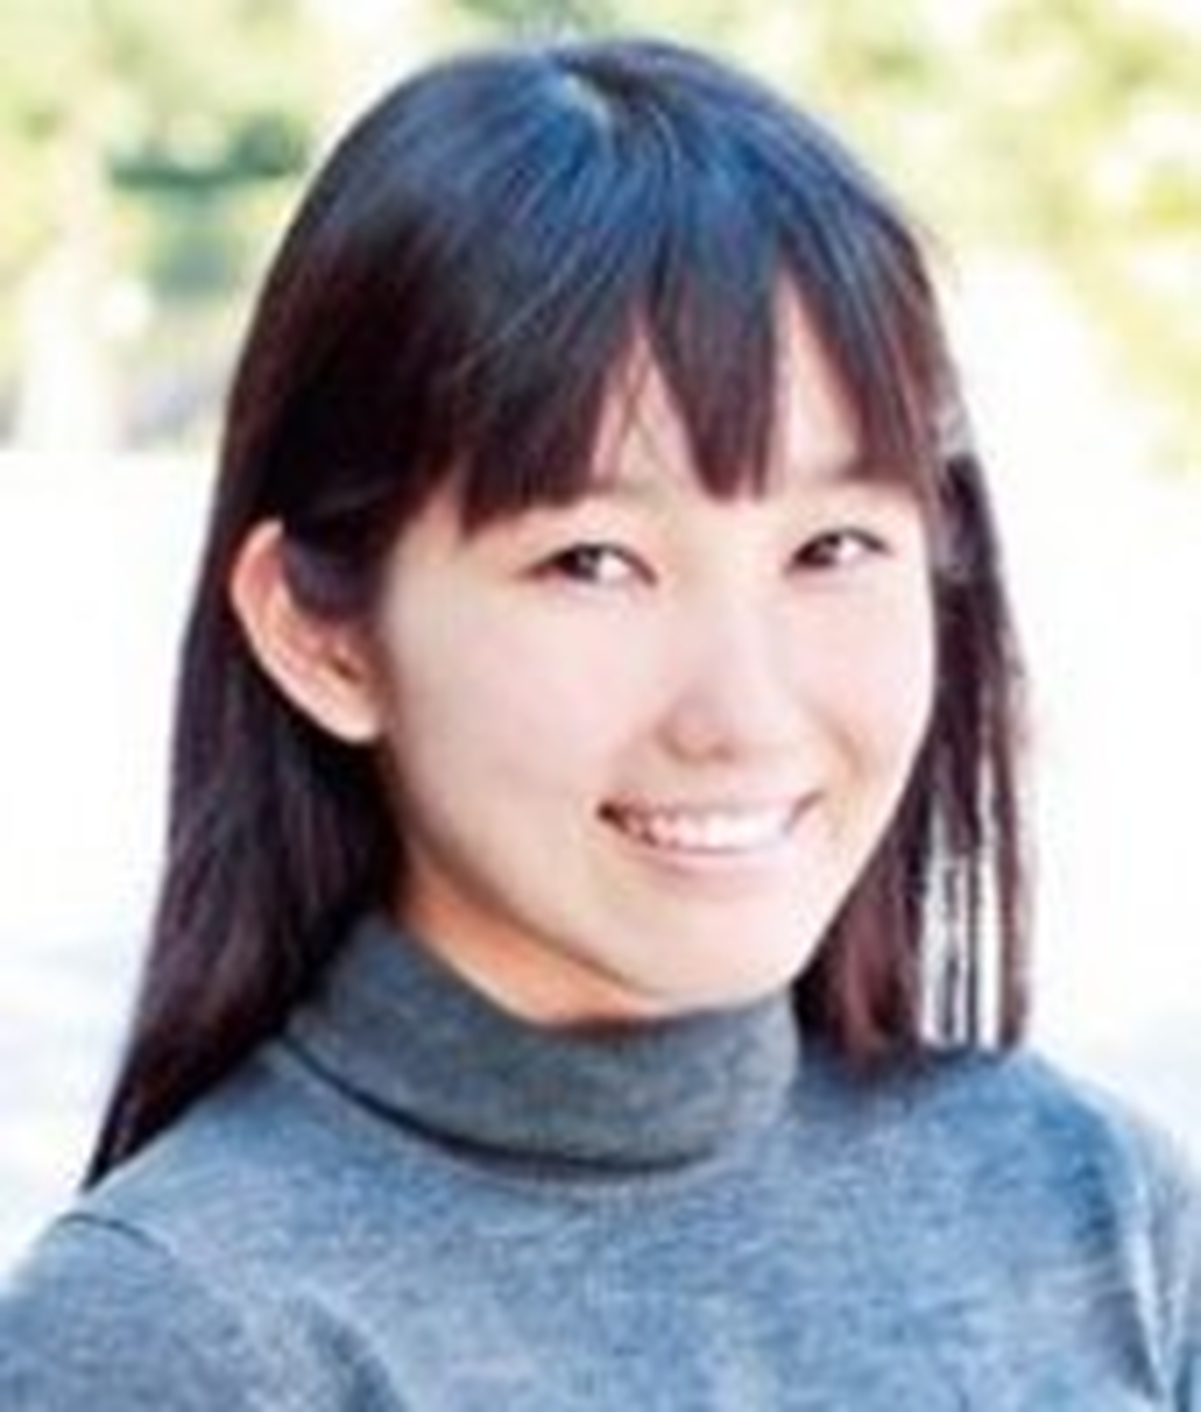 Yui Kasugano wiki, Yui Kasugano bio, Yui Kasugano news